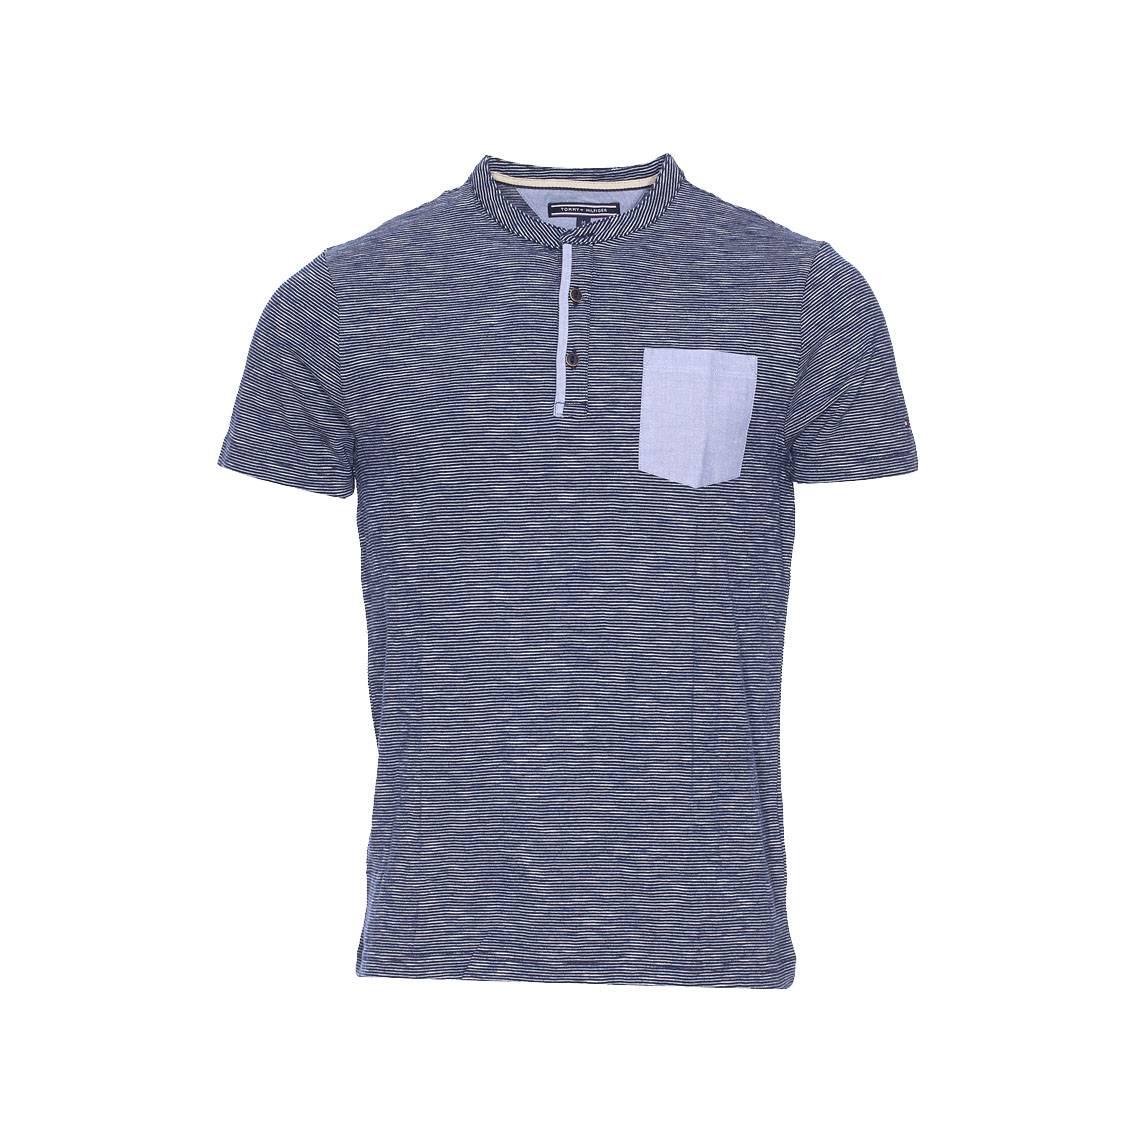 tee shirt sasha tommy hilfiger col tunisien en coton bleu marine fine rayures blanches rue. Black Bedroom Furniture Sets. Home Design Ideas